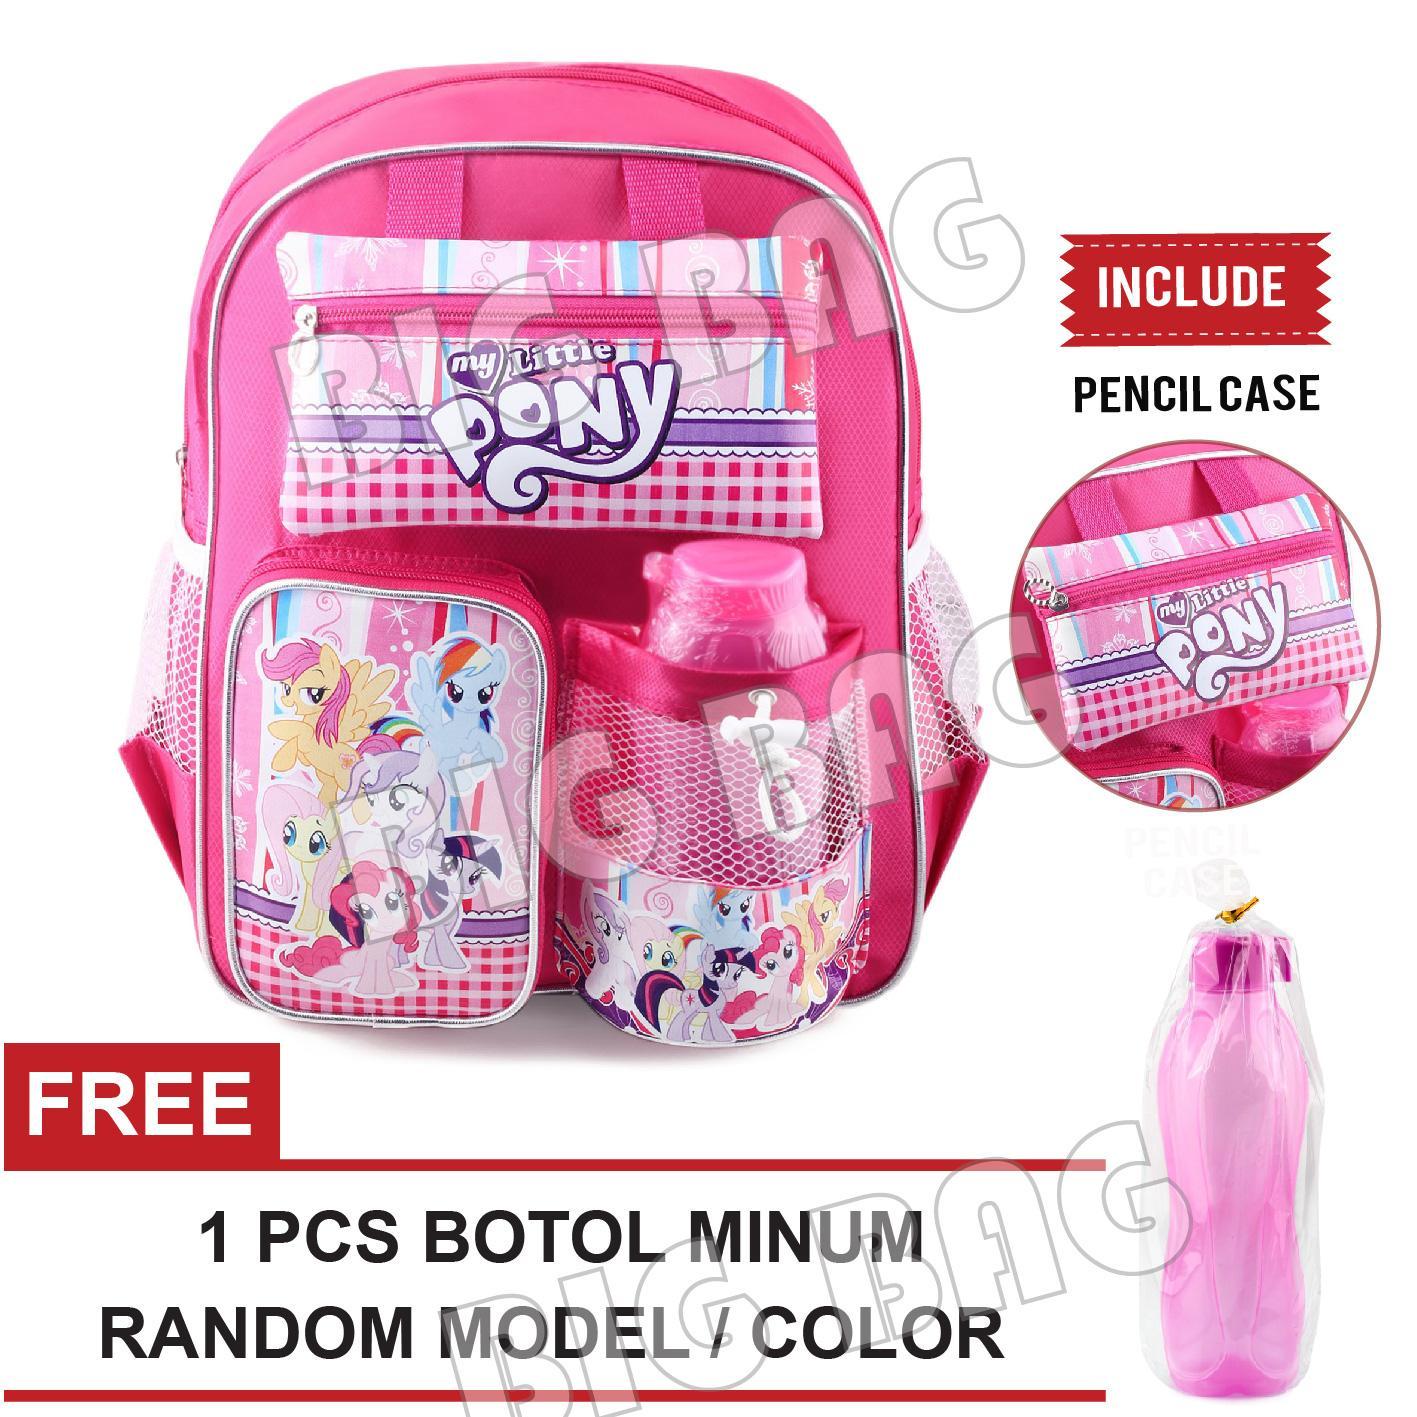 Tas Ransel Anak Perempuan Karakter - My Little Pony - STAY + FREE Botol  Minum- 0e6f8305fd